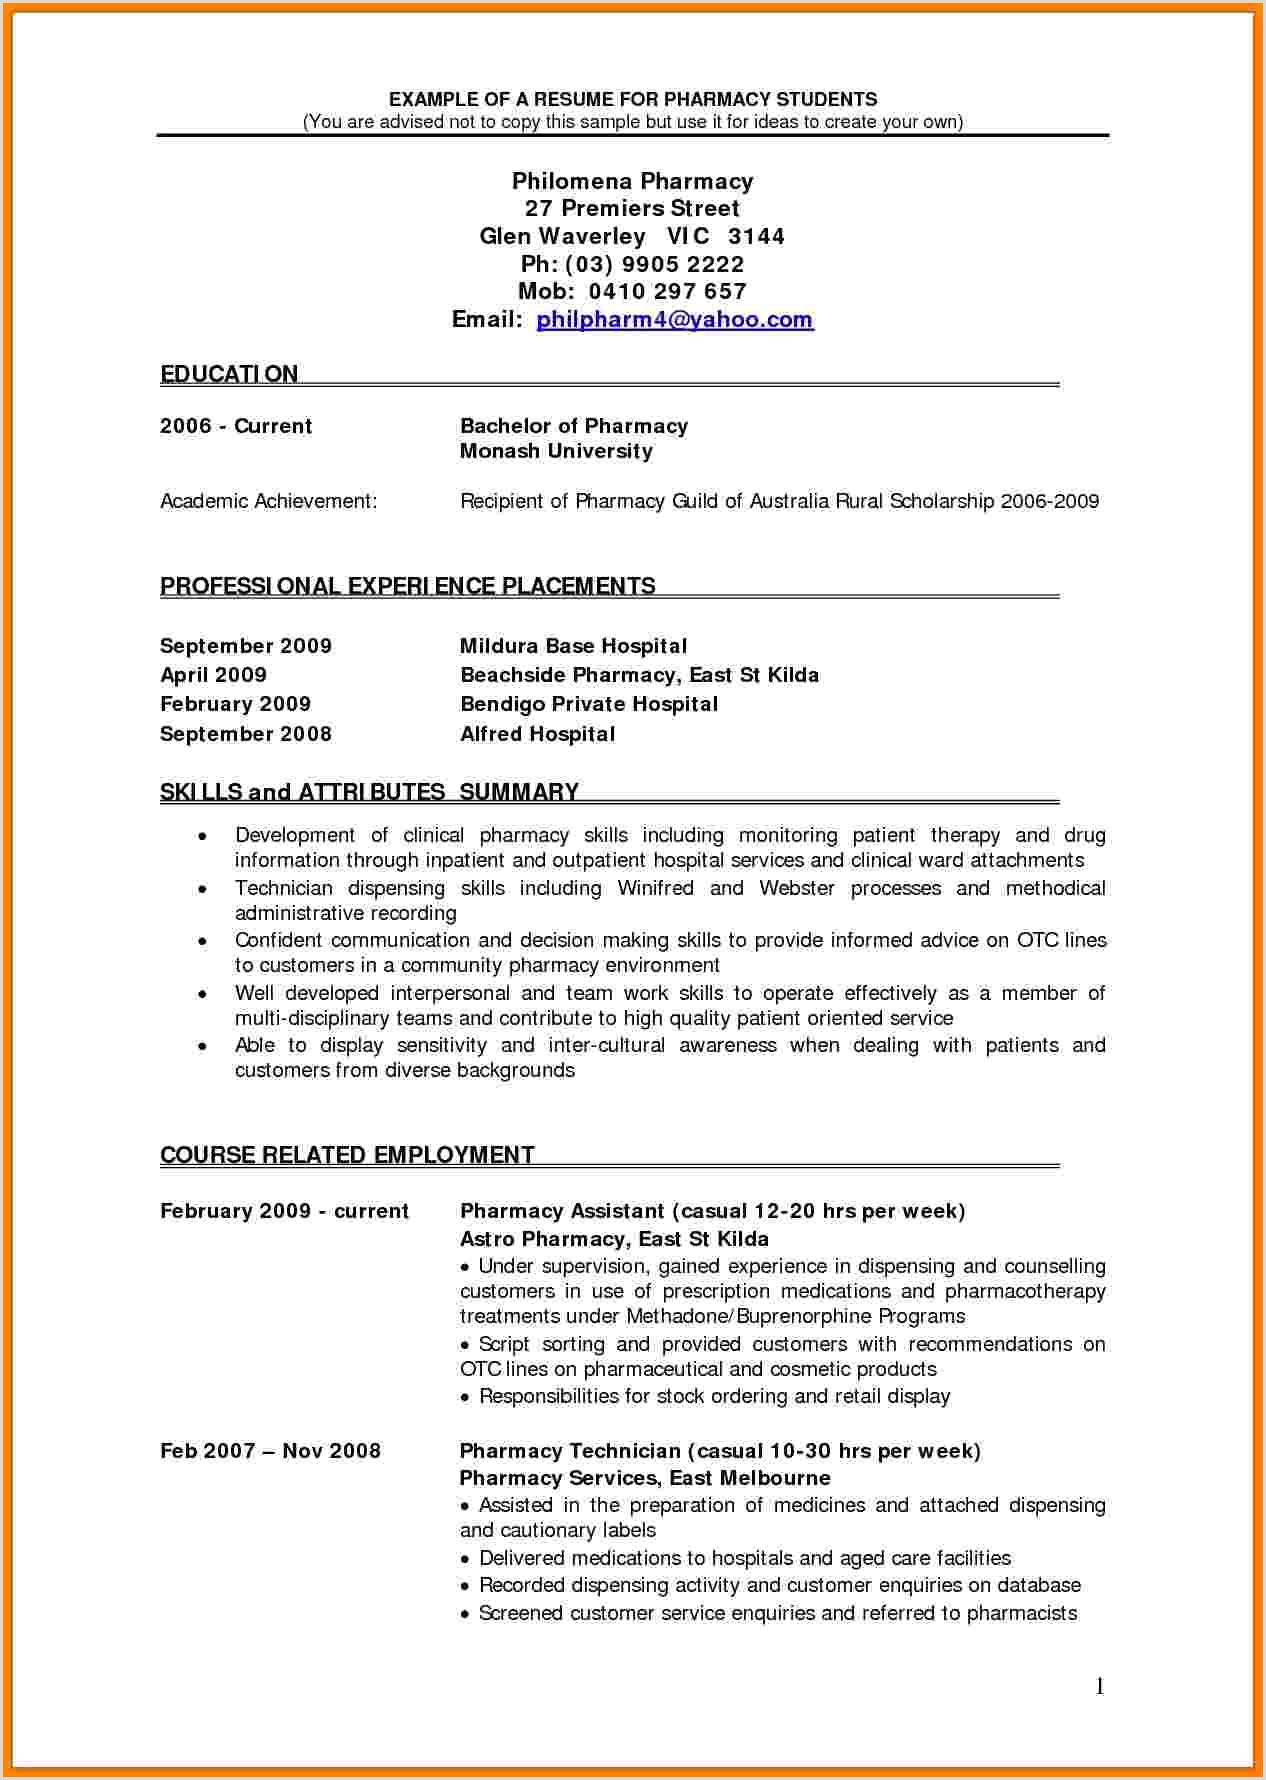 Pharmacist Curriculum Vitae Examples 5 Cv Pharmacist Example